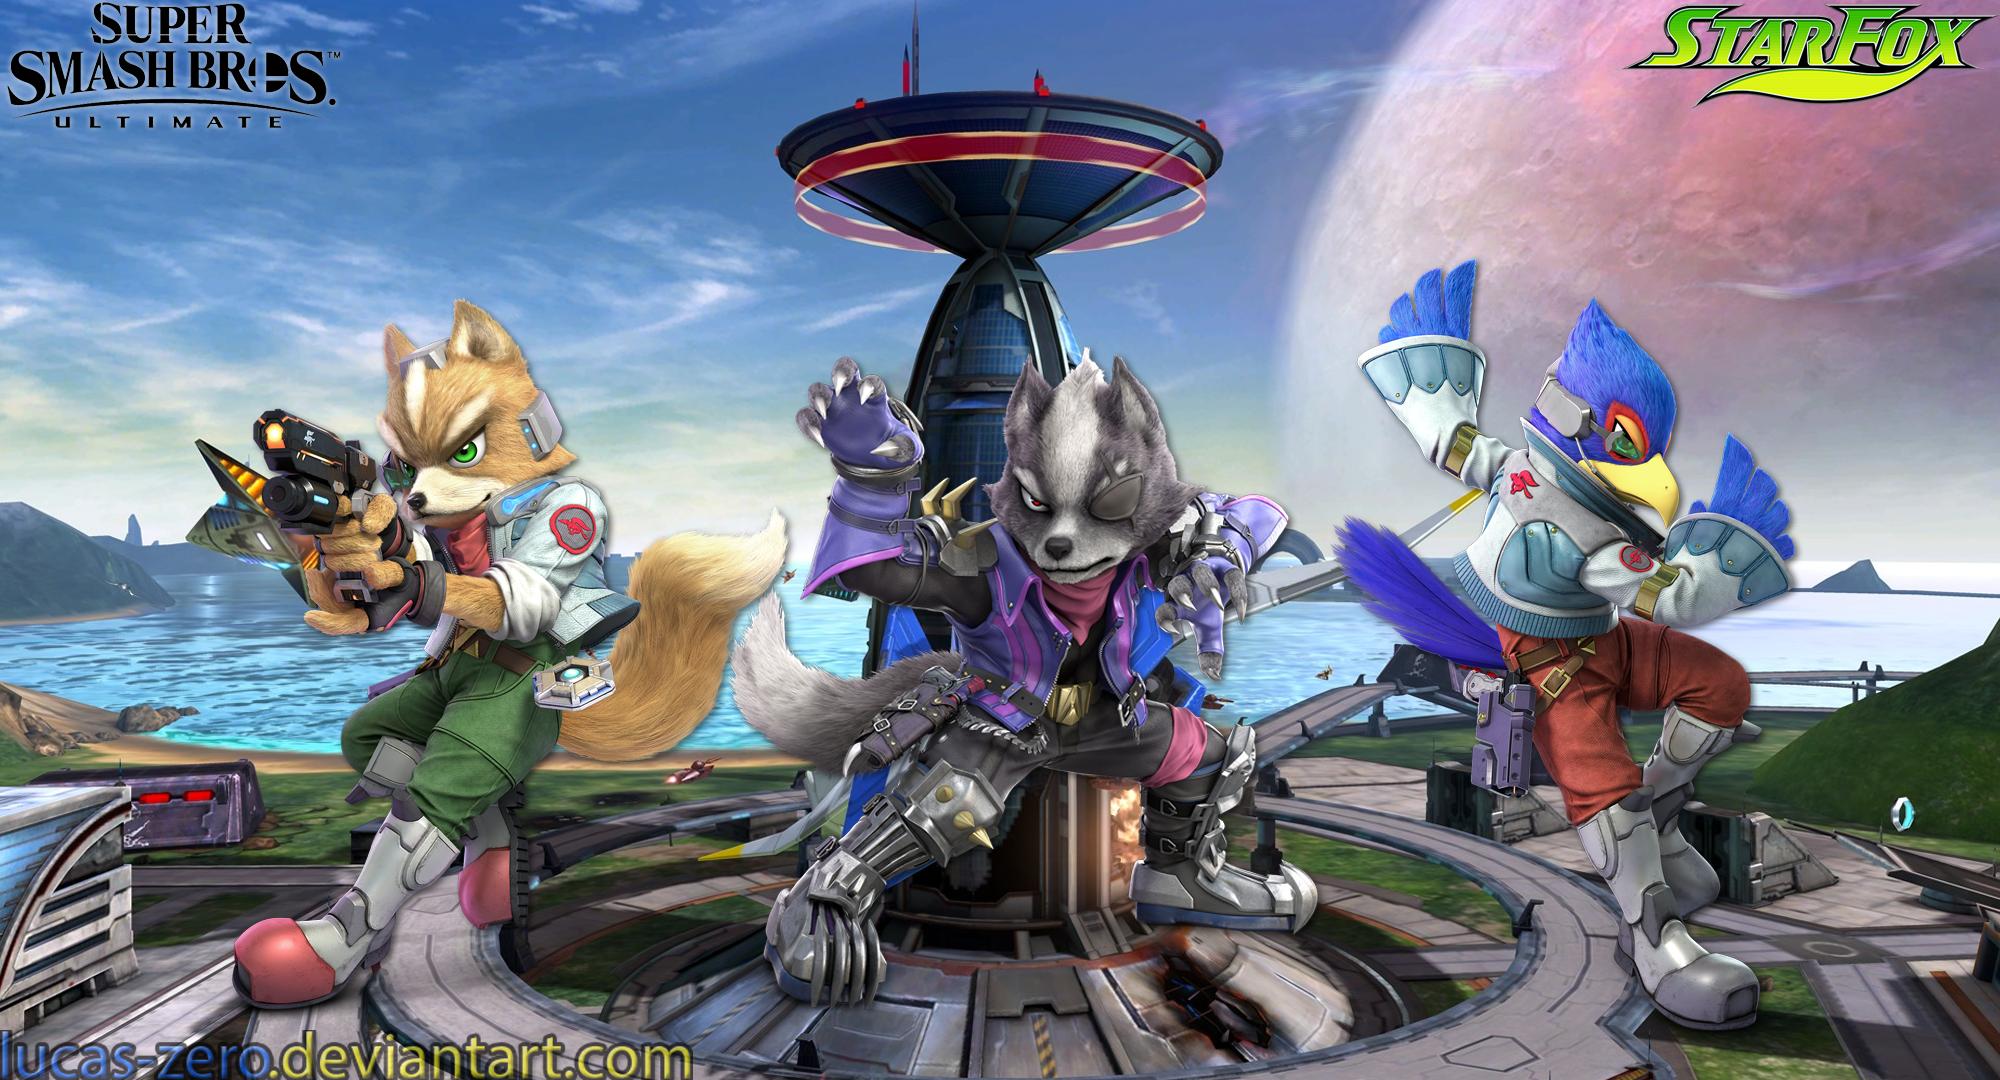 Star Fox Super Smash Bros Ultimate Wallpaper By Lucas Zero On